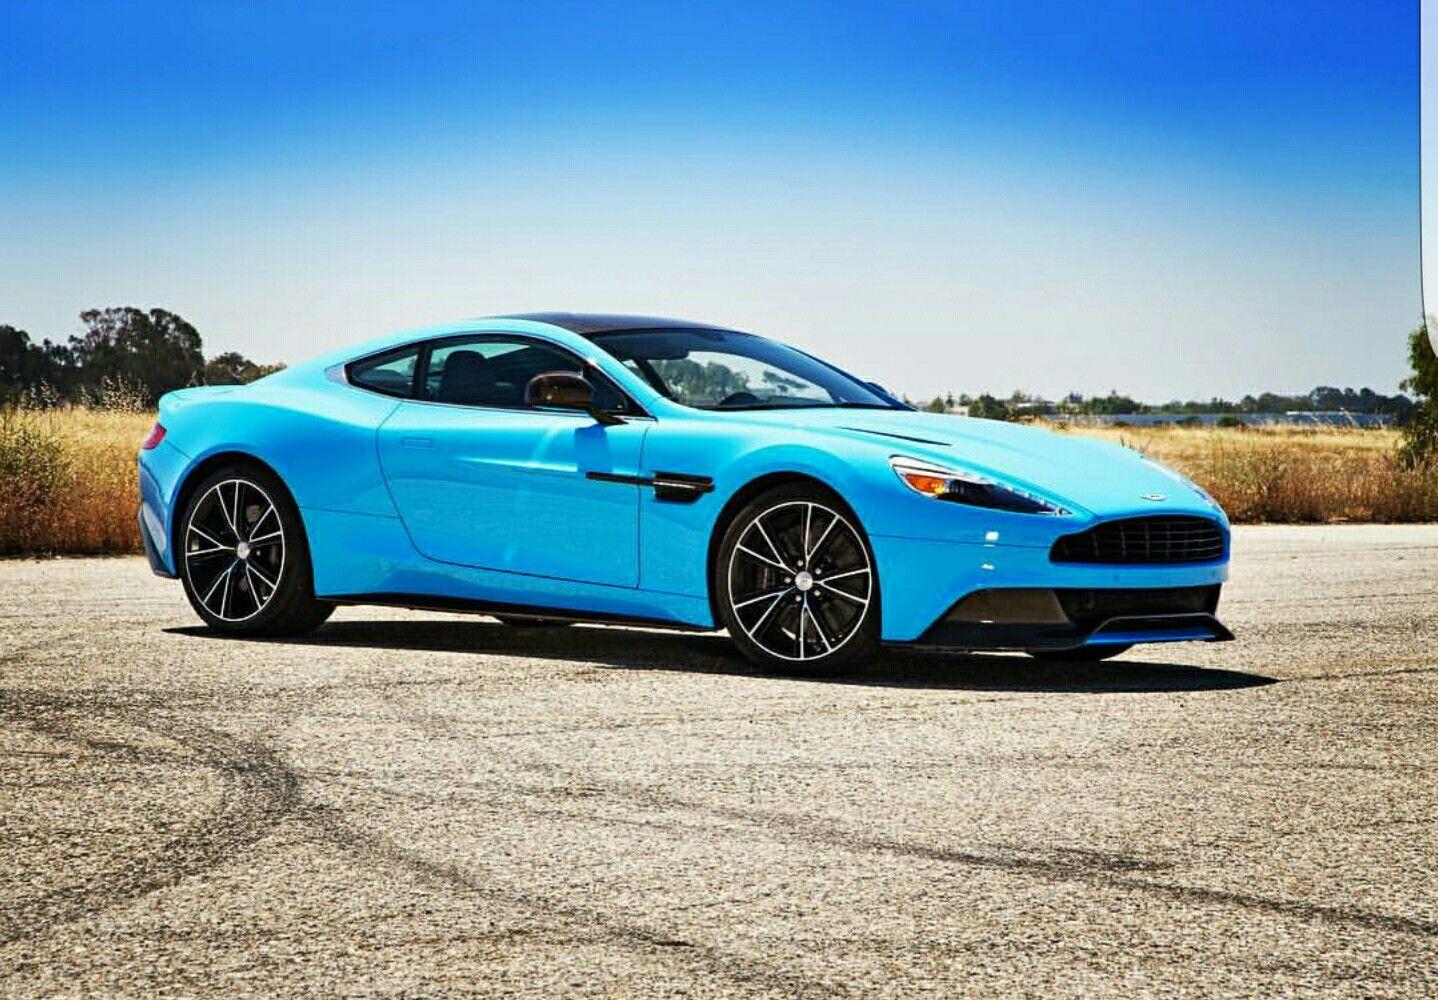 Vanquish Aston Martin Vanquish Aston Martin Vanquish